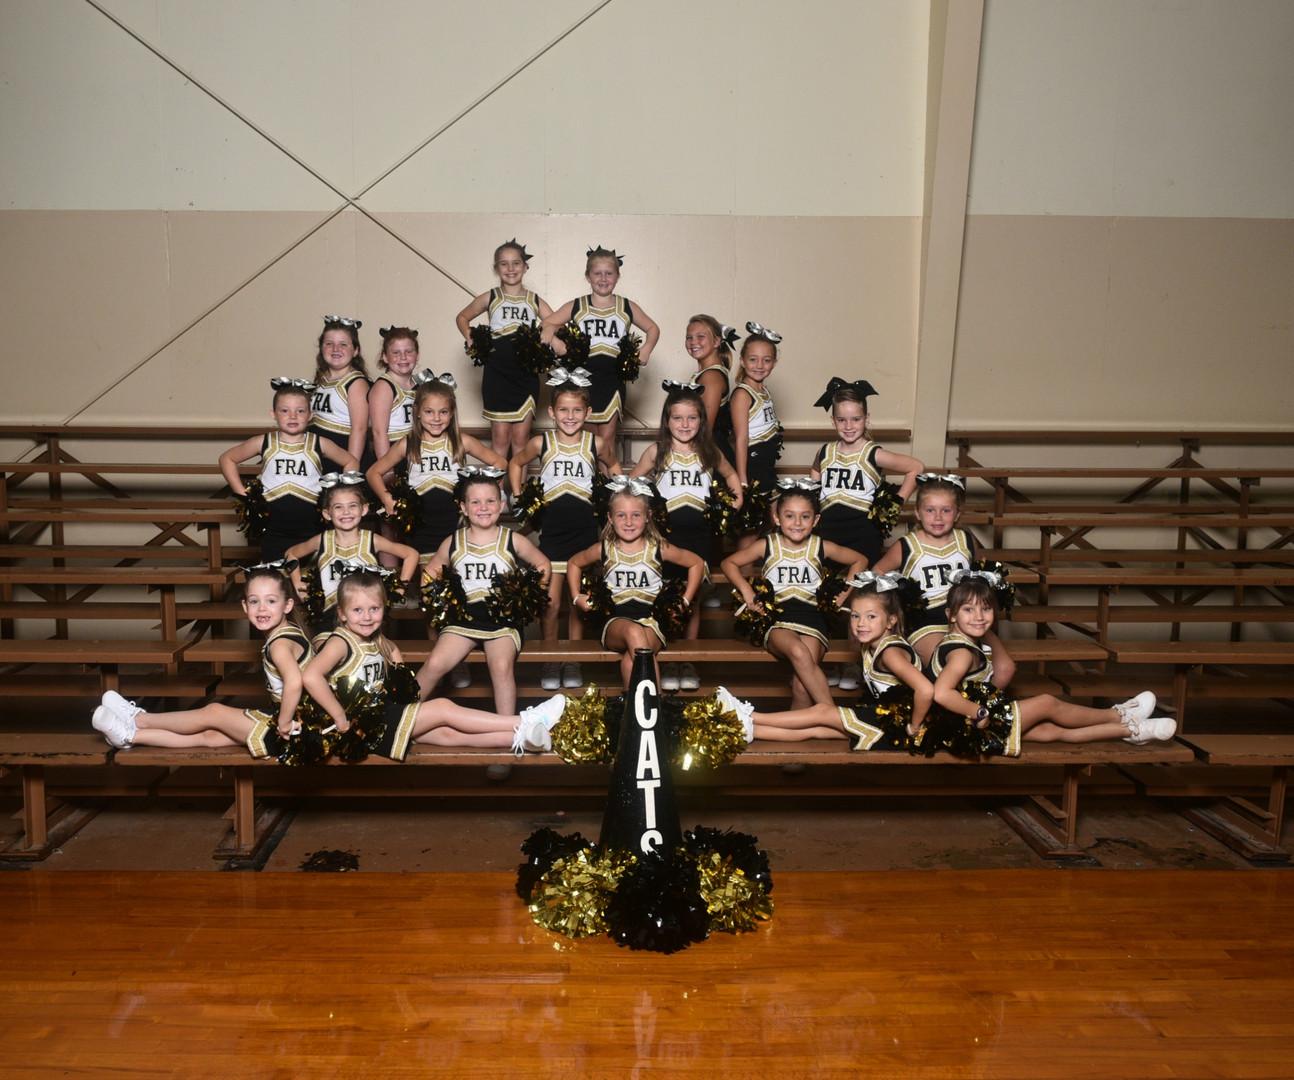 2020 C Team Cheerleaders